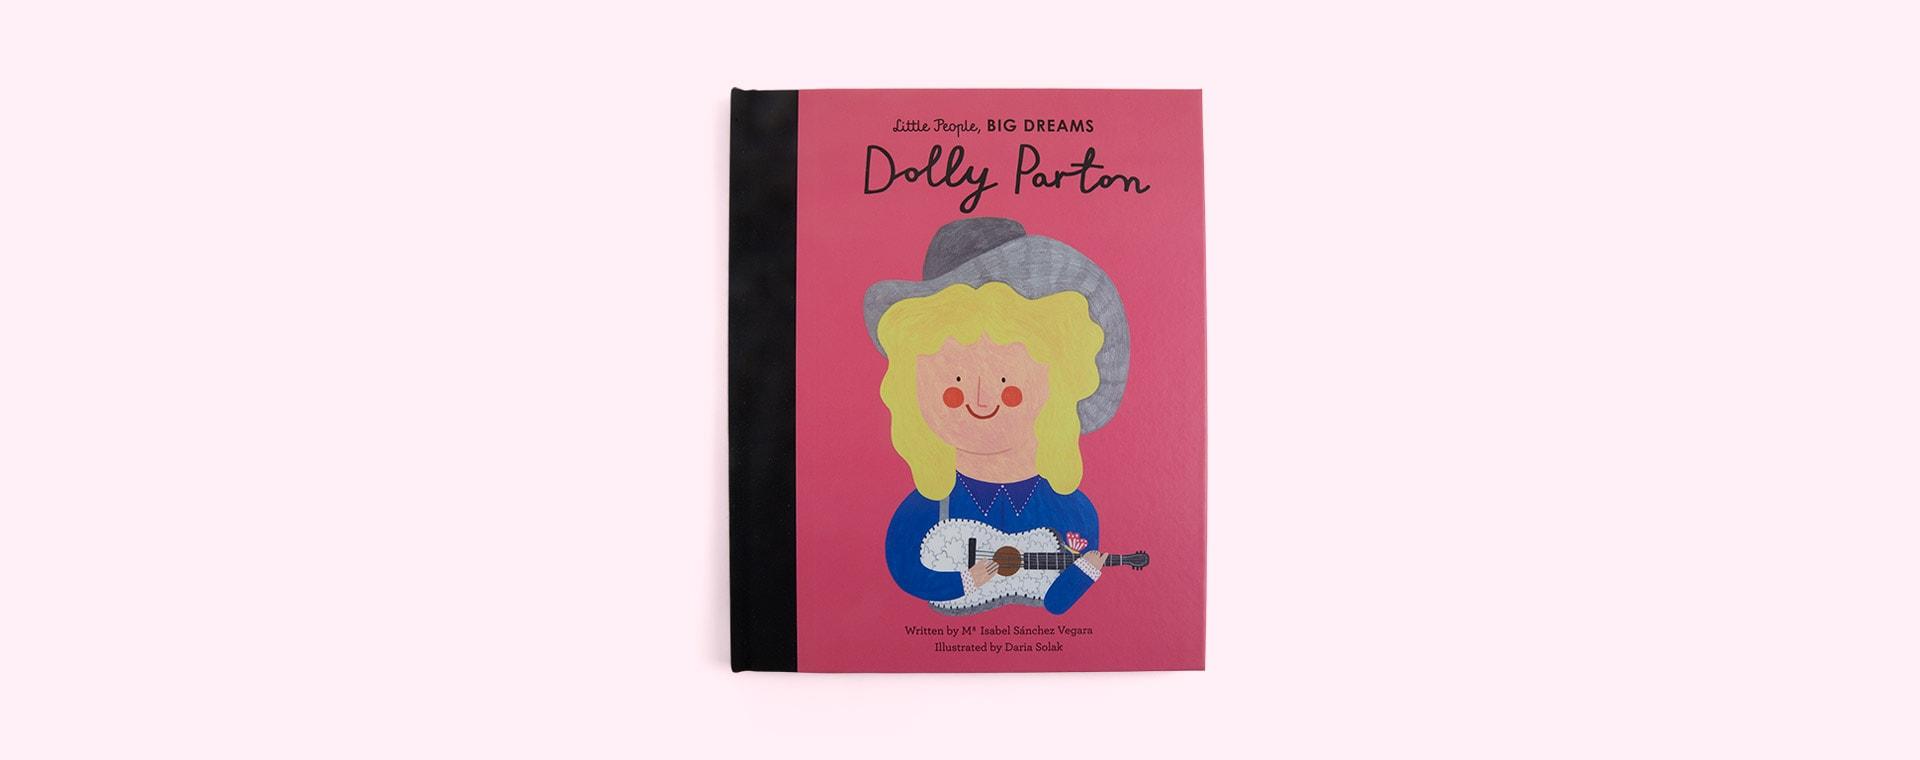 Multi bookspeed Little People Big Dreams: Dolly Parton